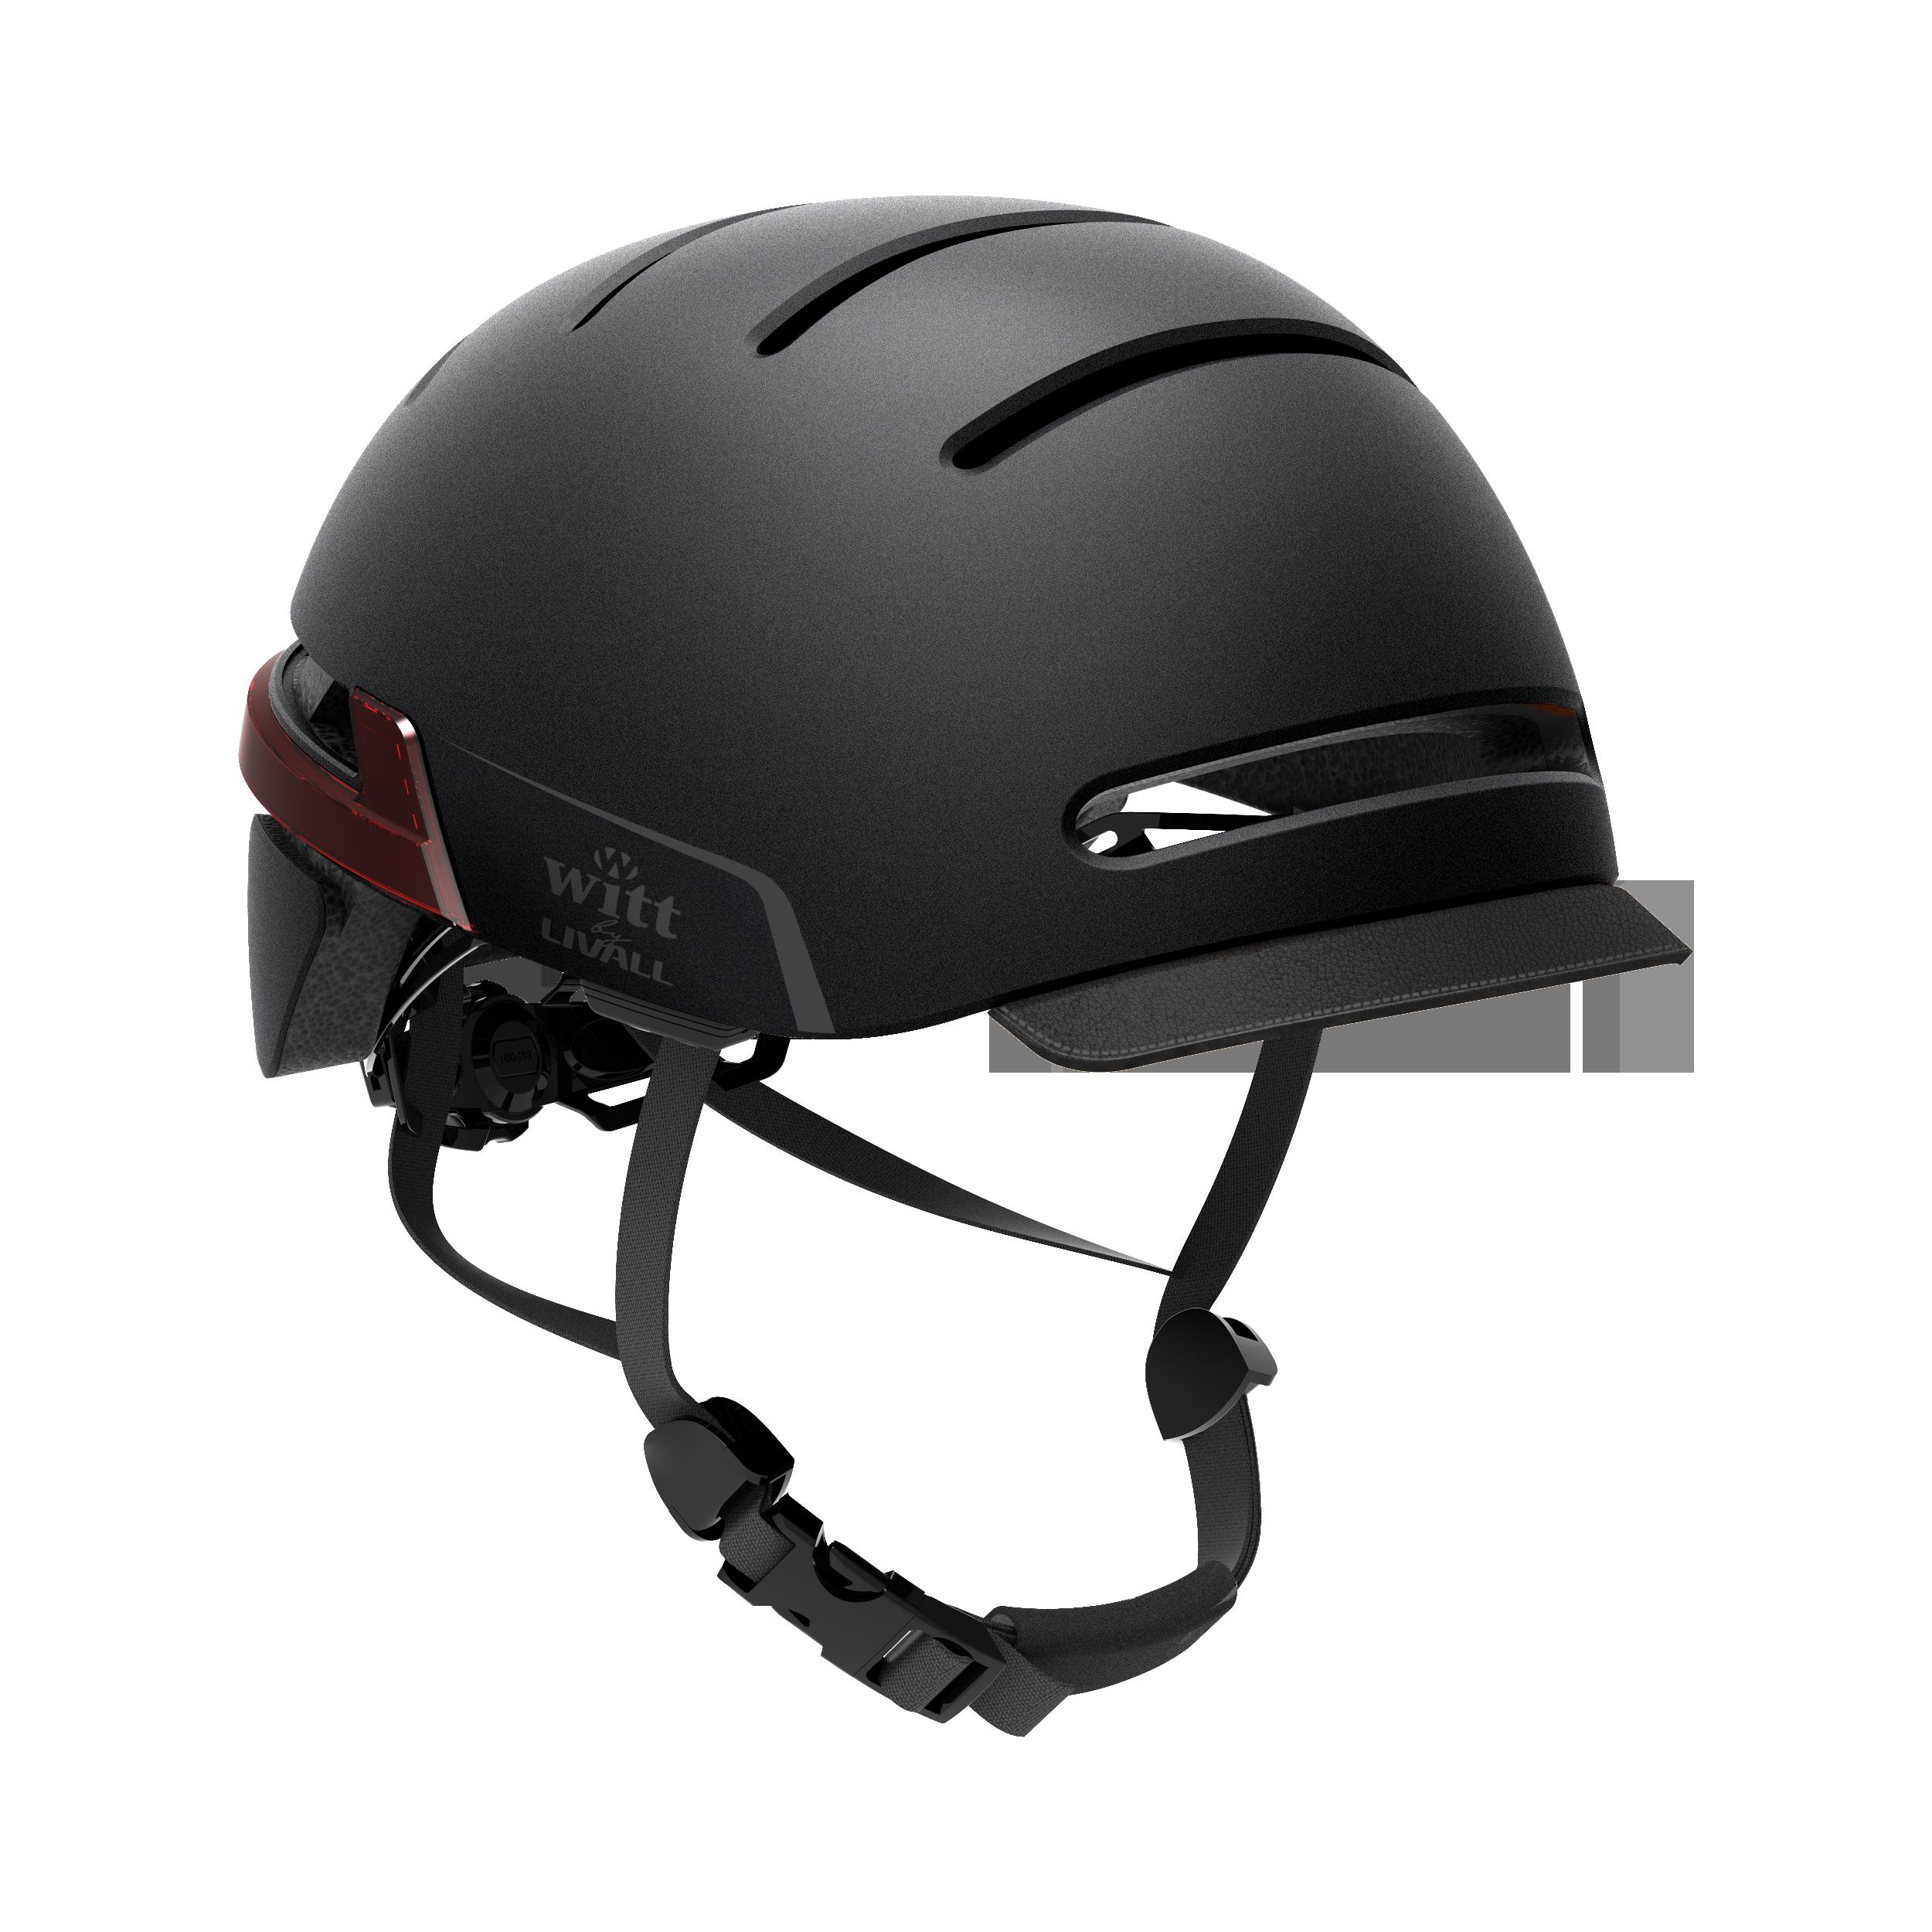 Witt by Livall - Smart Multi Function Helmet - Interaktive - BH51MSB